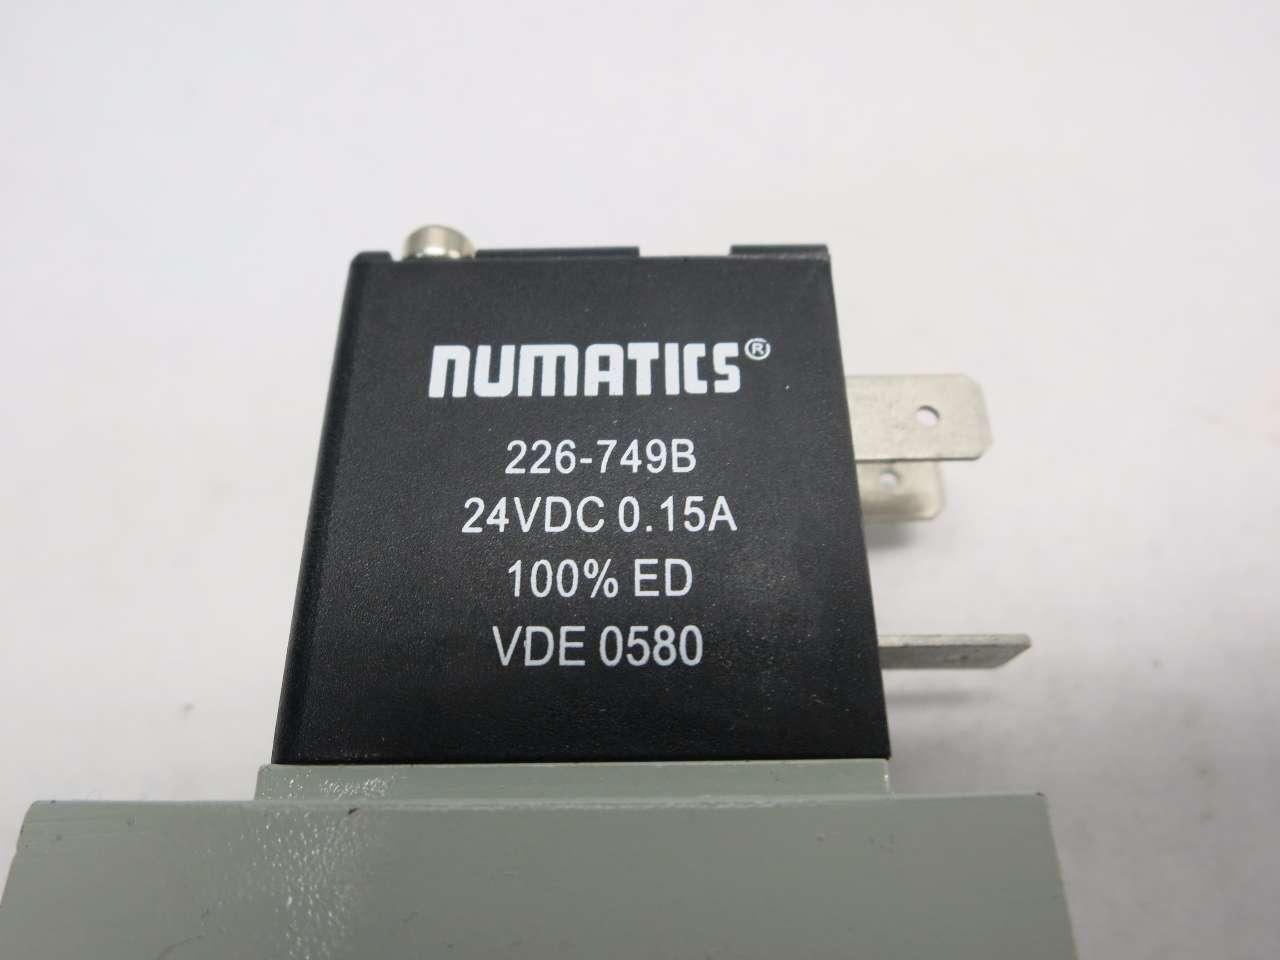 Numatics 226-749B Soleniod Coil 24VDC 0.15A